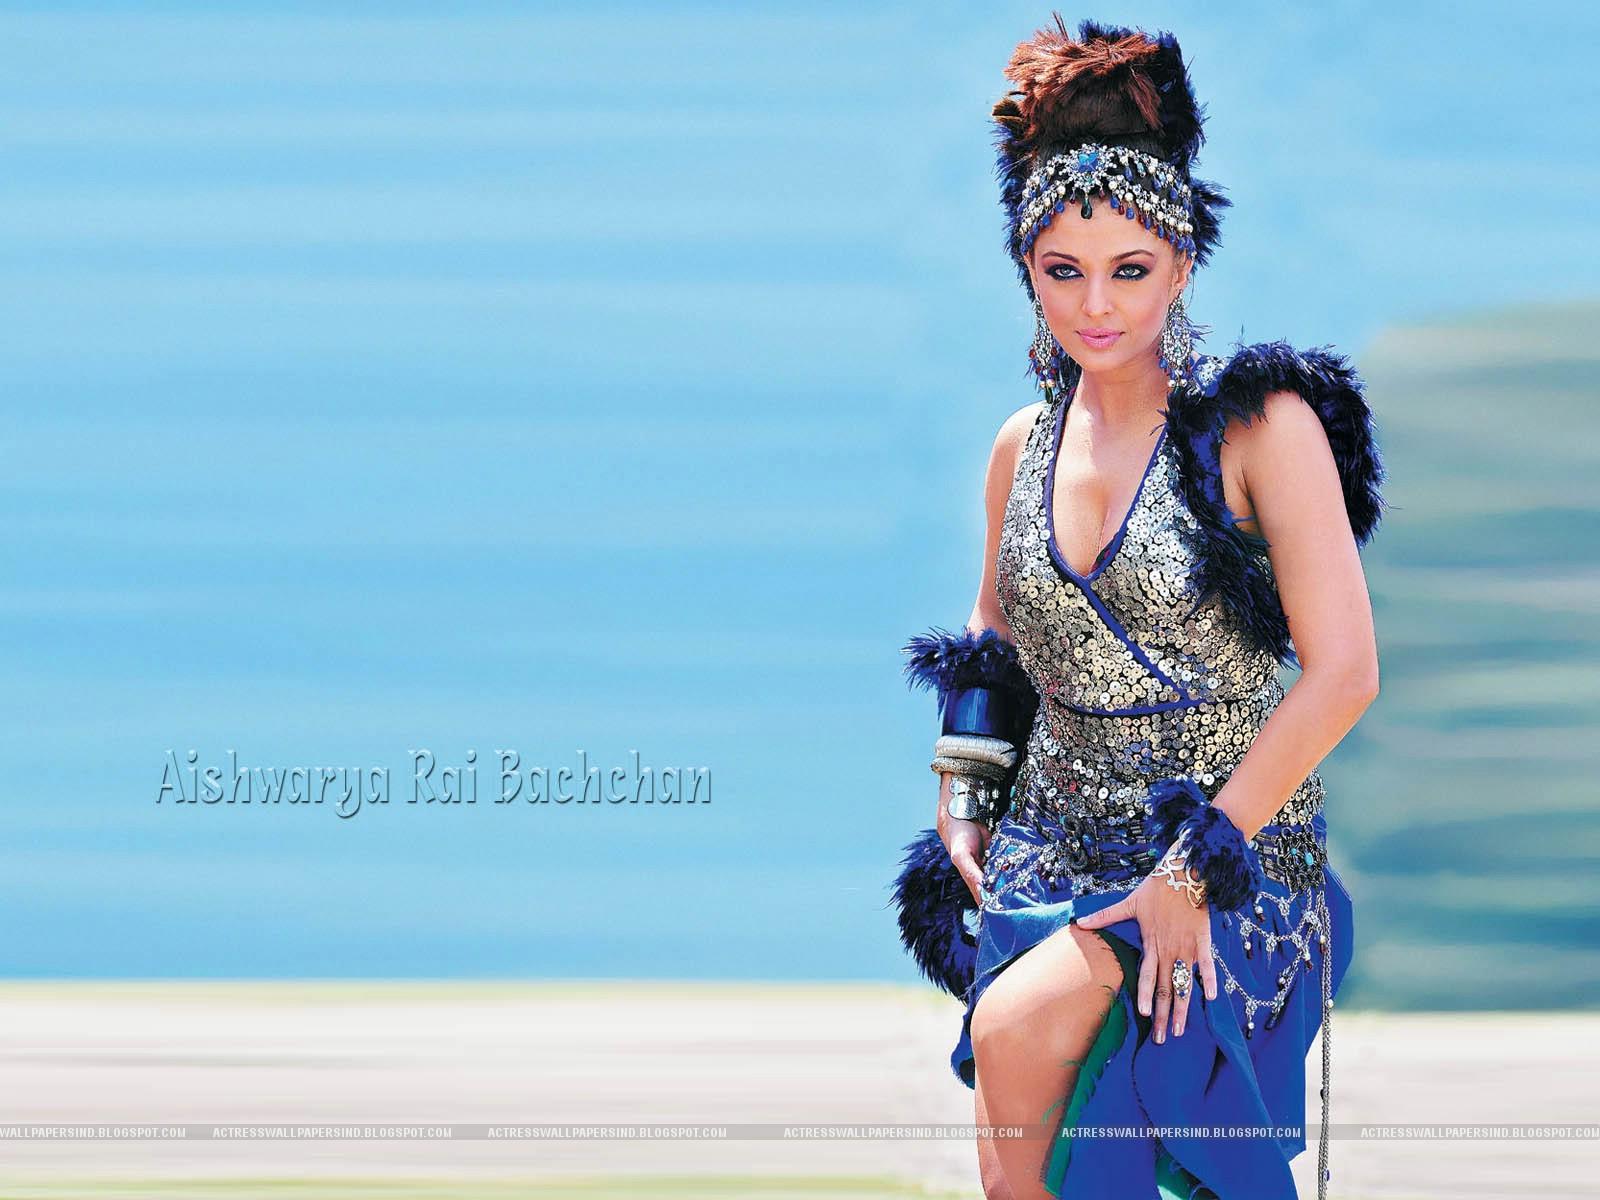 Aishwarya Rai Sexy Photo Shoot Hd Full - A Wind-2767